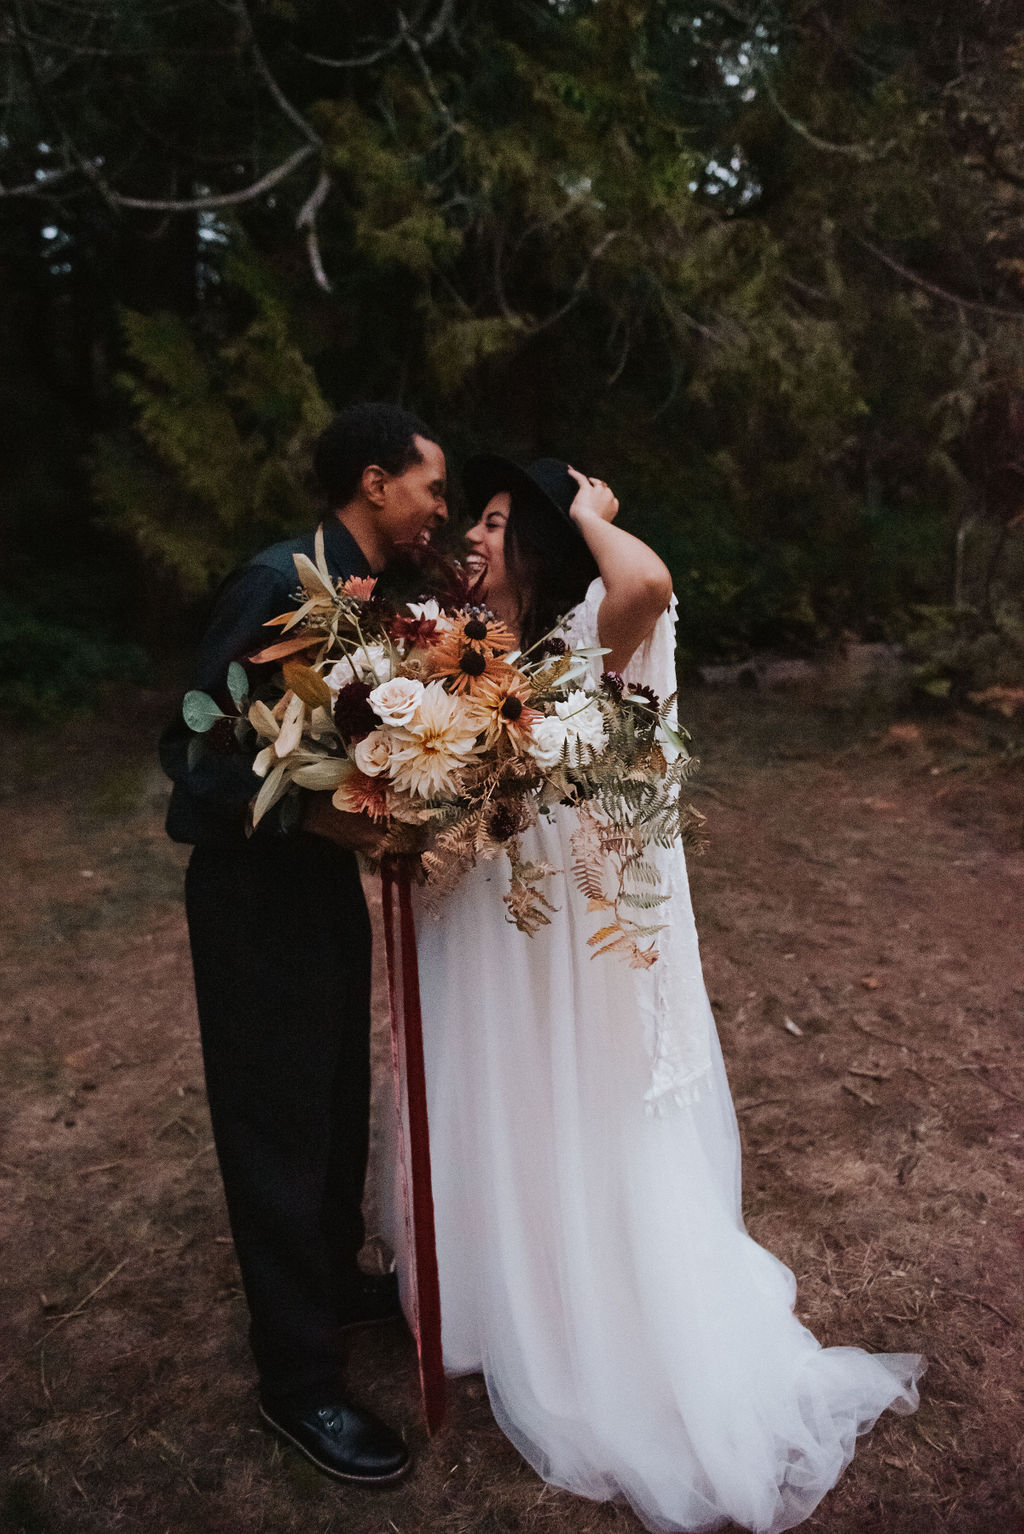 seattle elopement seattle small wedding seattle micro wedding seattle covid wedding seattle wedding flowers seattle wedding florist